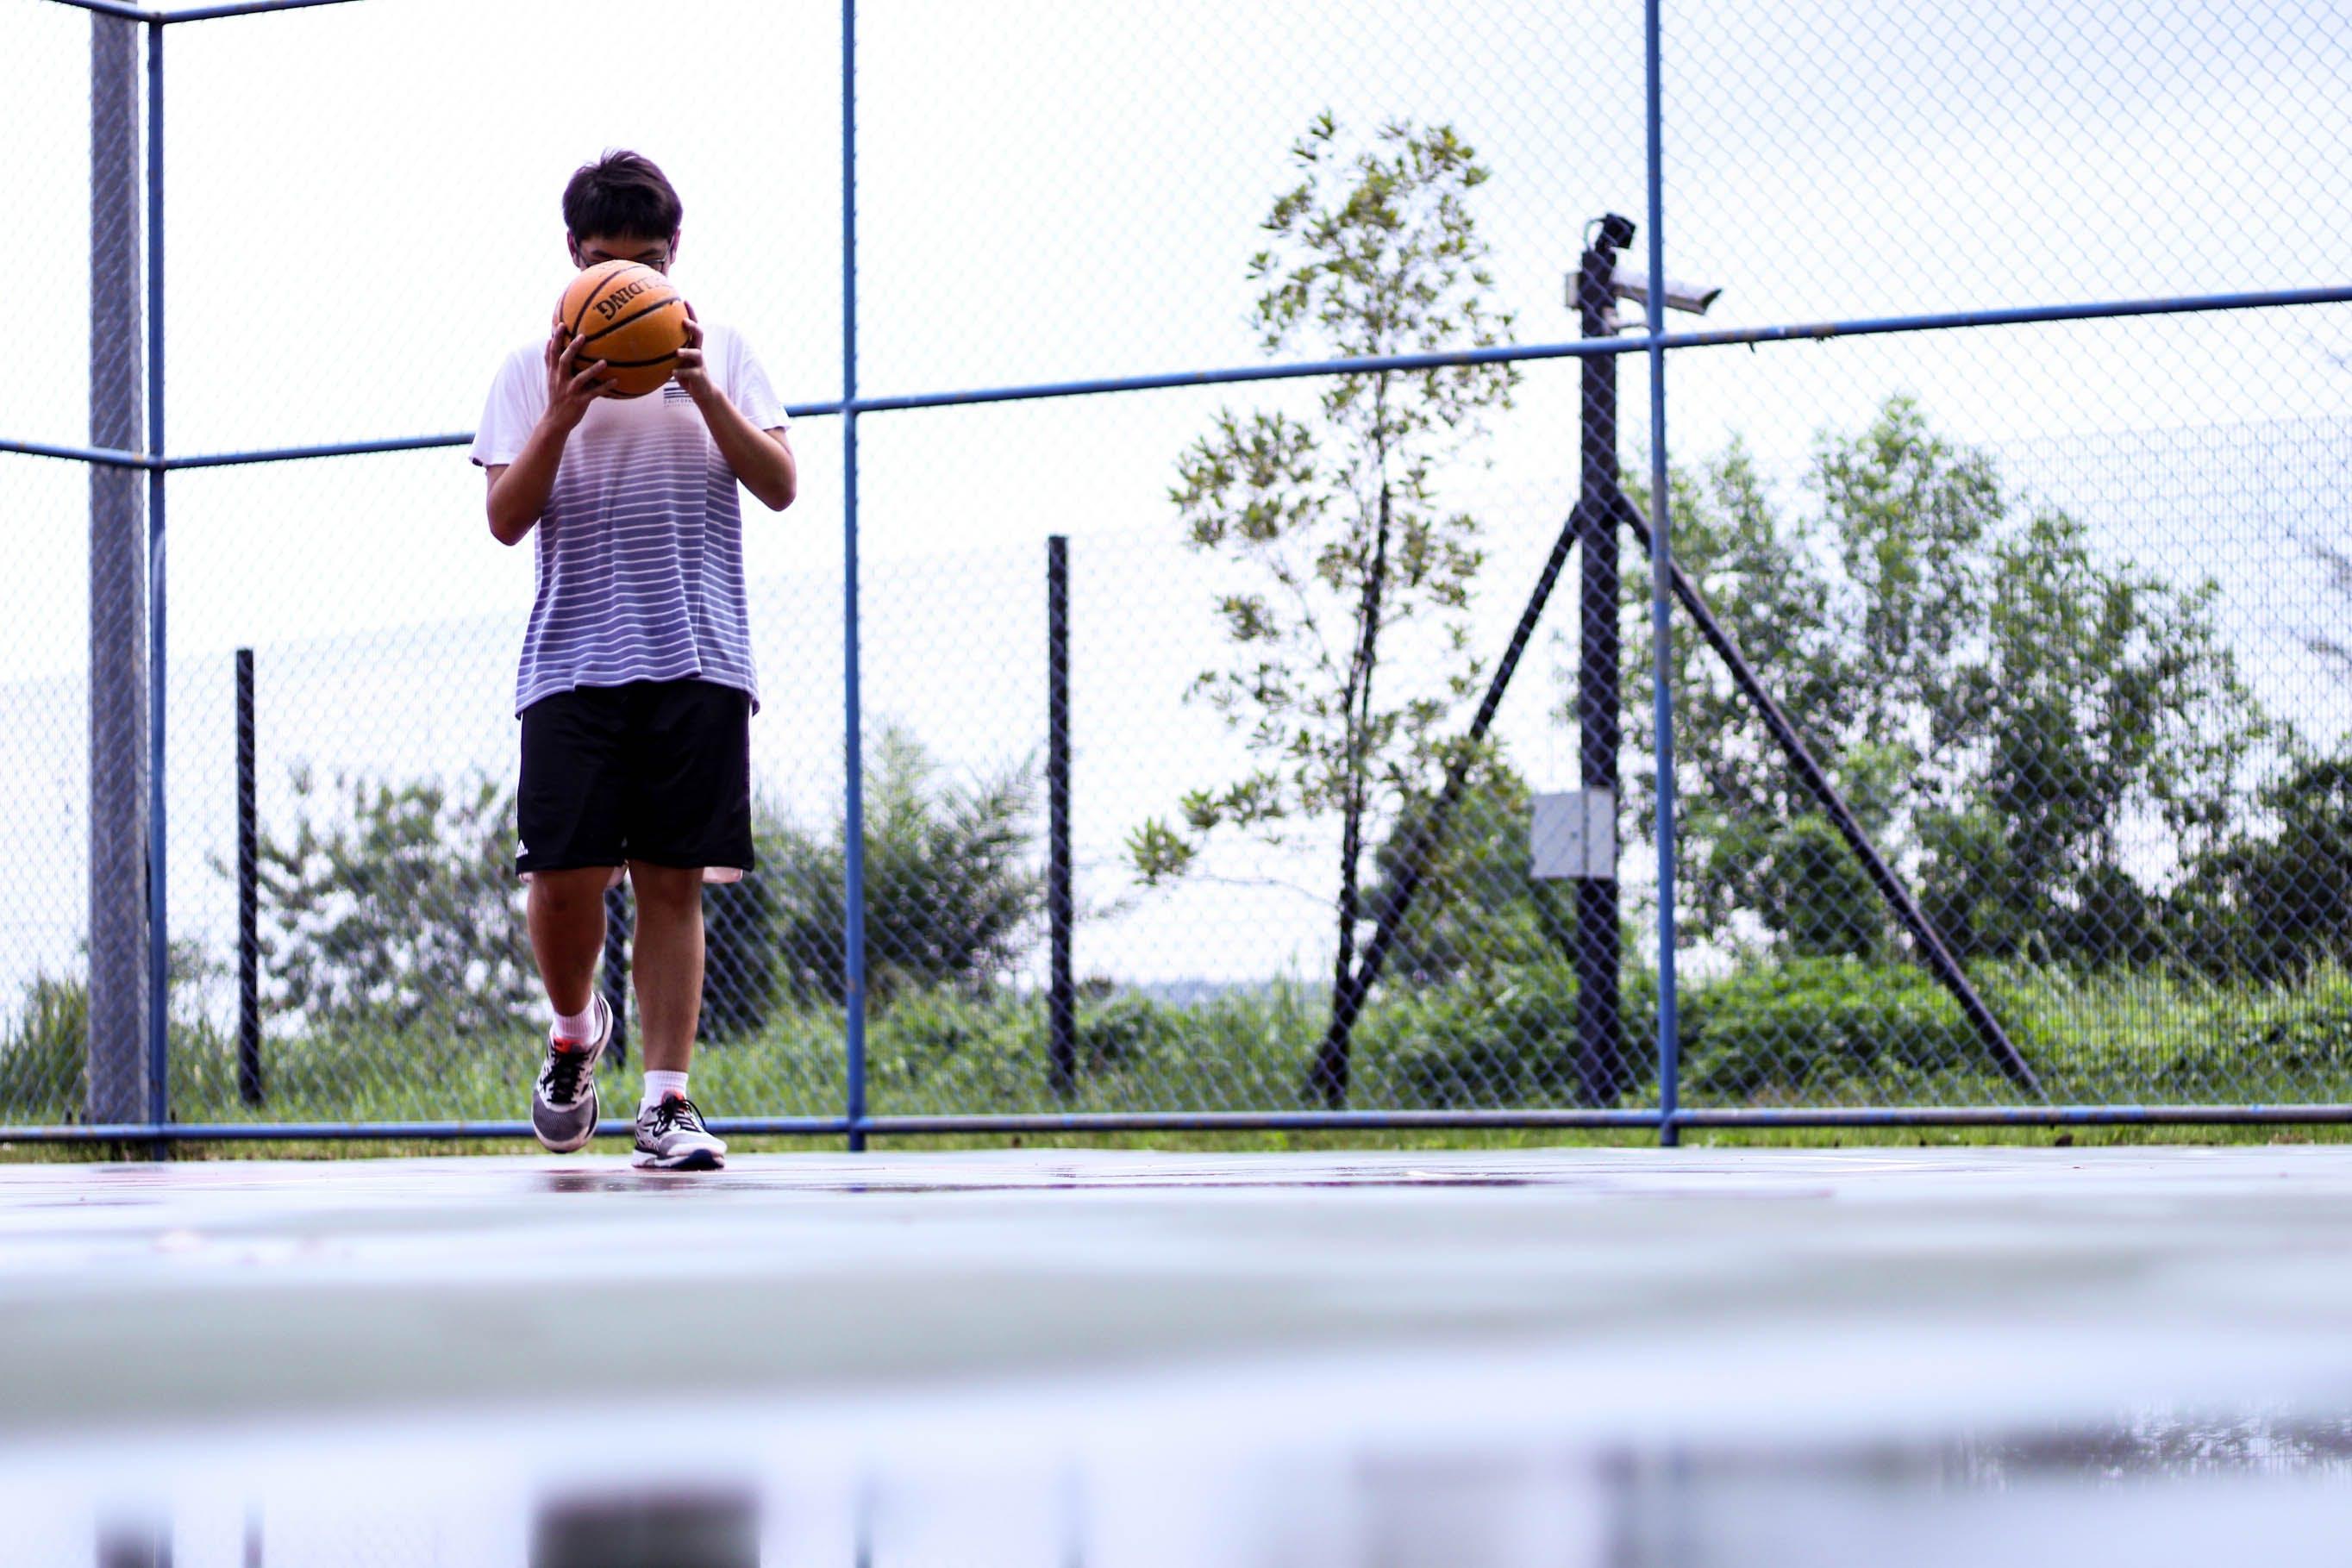 Man Holding Orange Basketball